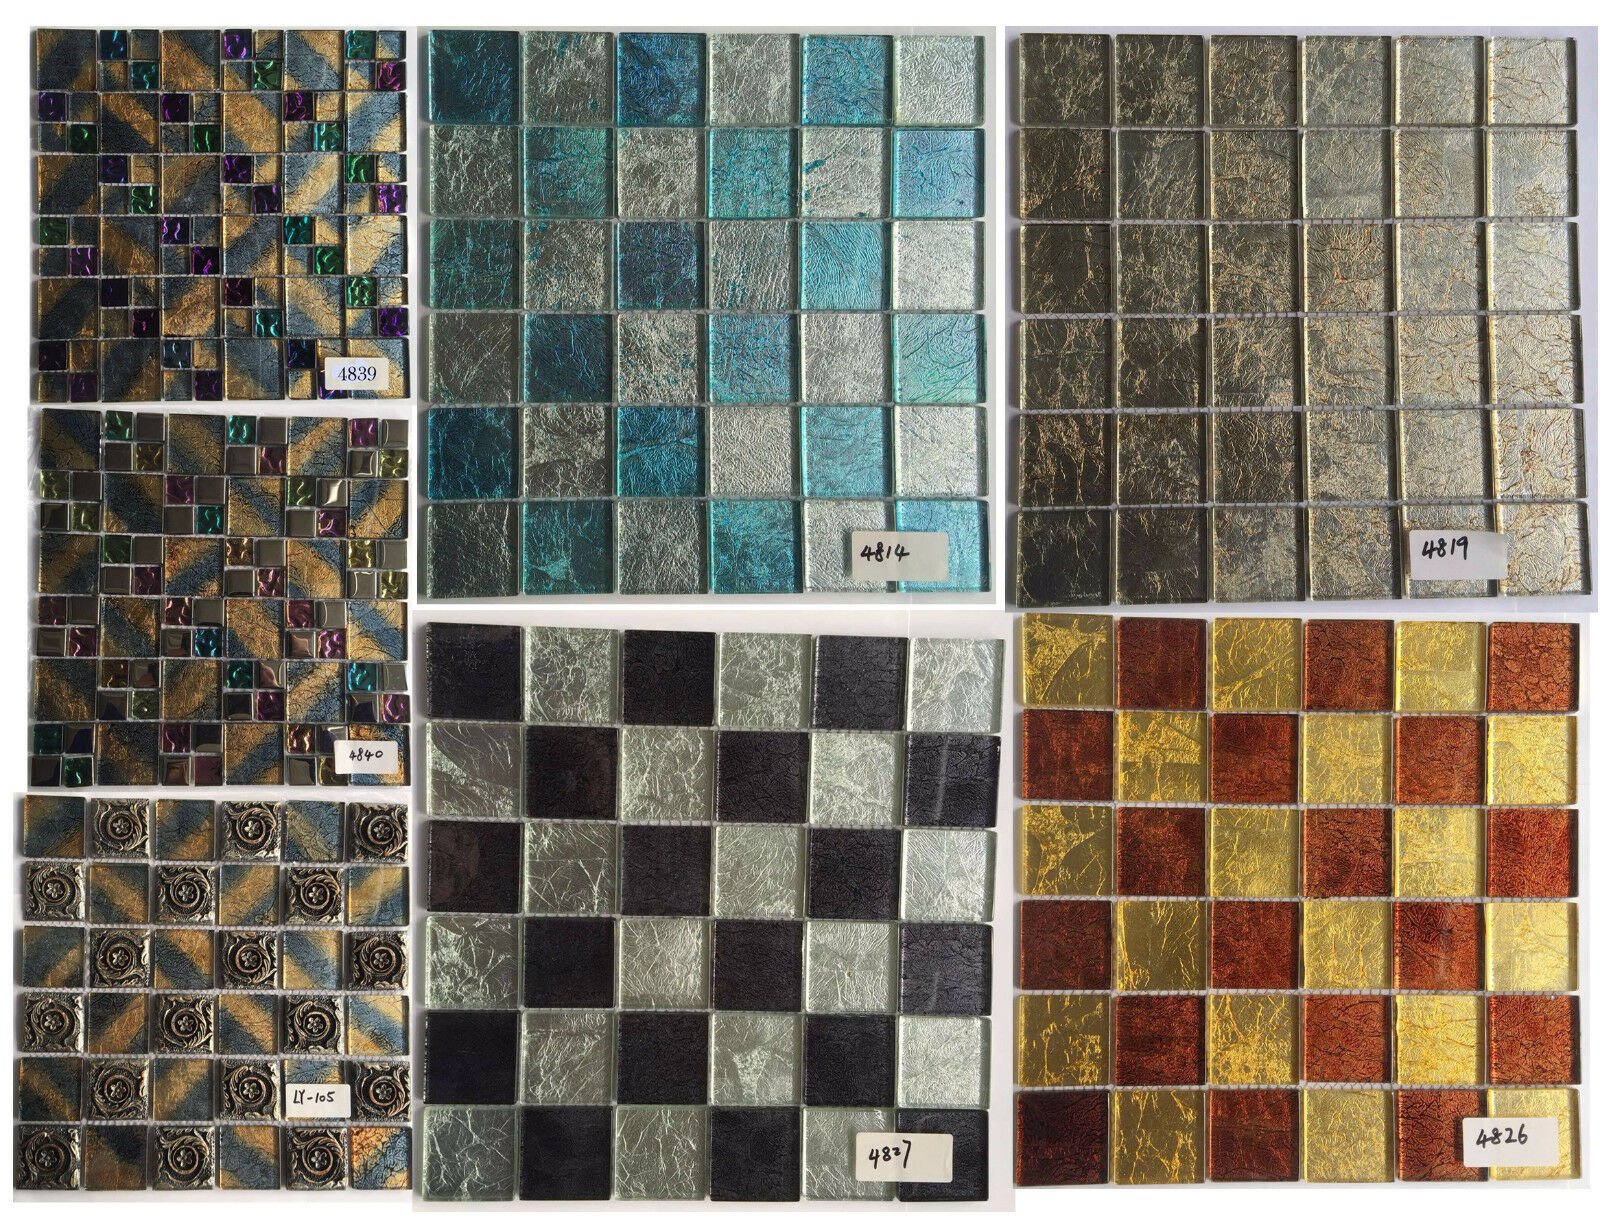 Chois Whole 12pcs Backsplash Tiles Close Out Gl Smart Mosaic Walls Ly105 1pc Ebay